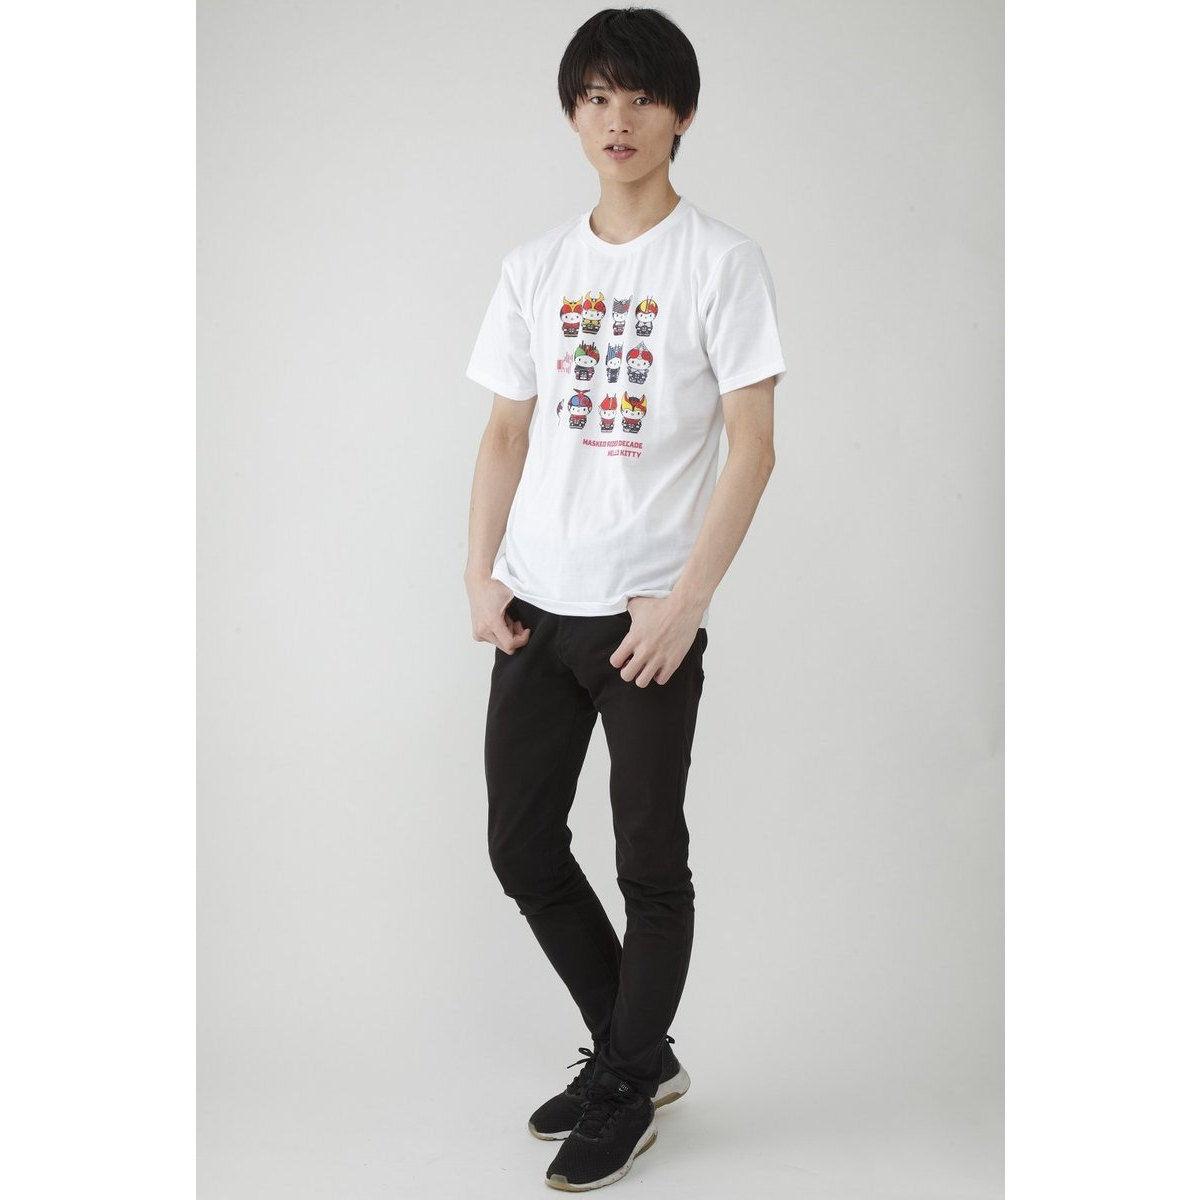 Full-color Printed T-shirt—Kamen Rider Decade/Hello Kitty Collaboration